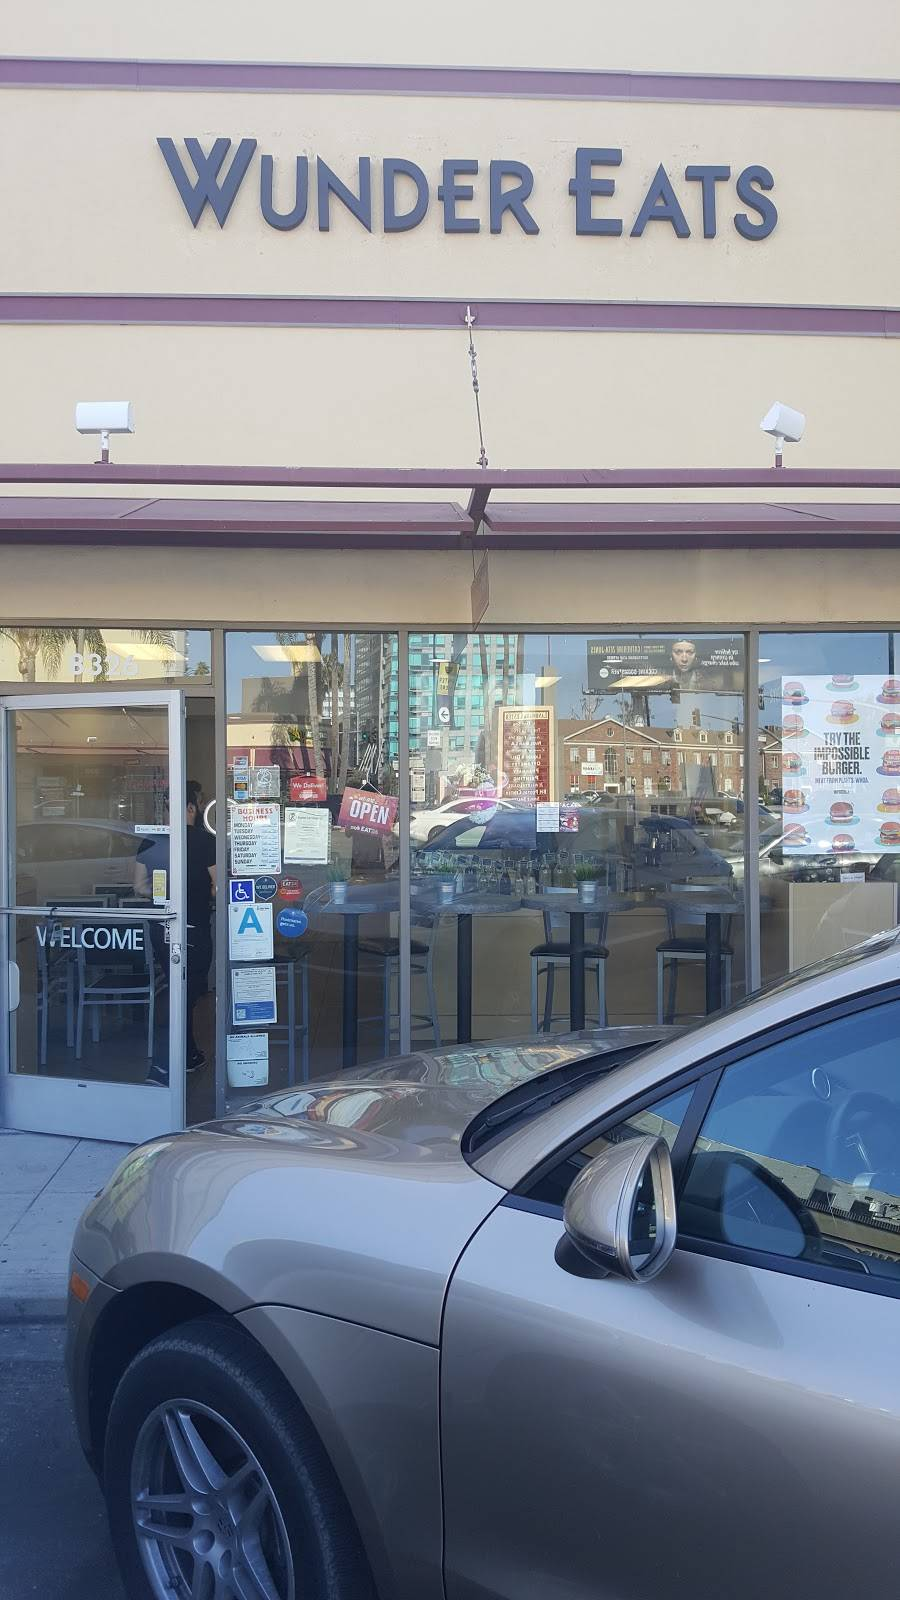 Wunder Eats | restaurant | 8326 Wilshire Blvd, Beverly Hills, CA 90211, USA | 3234520487 OR +1 323-452-0487